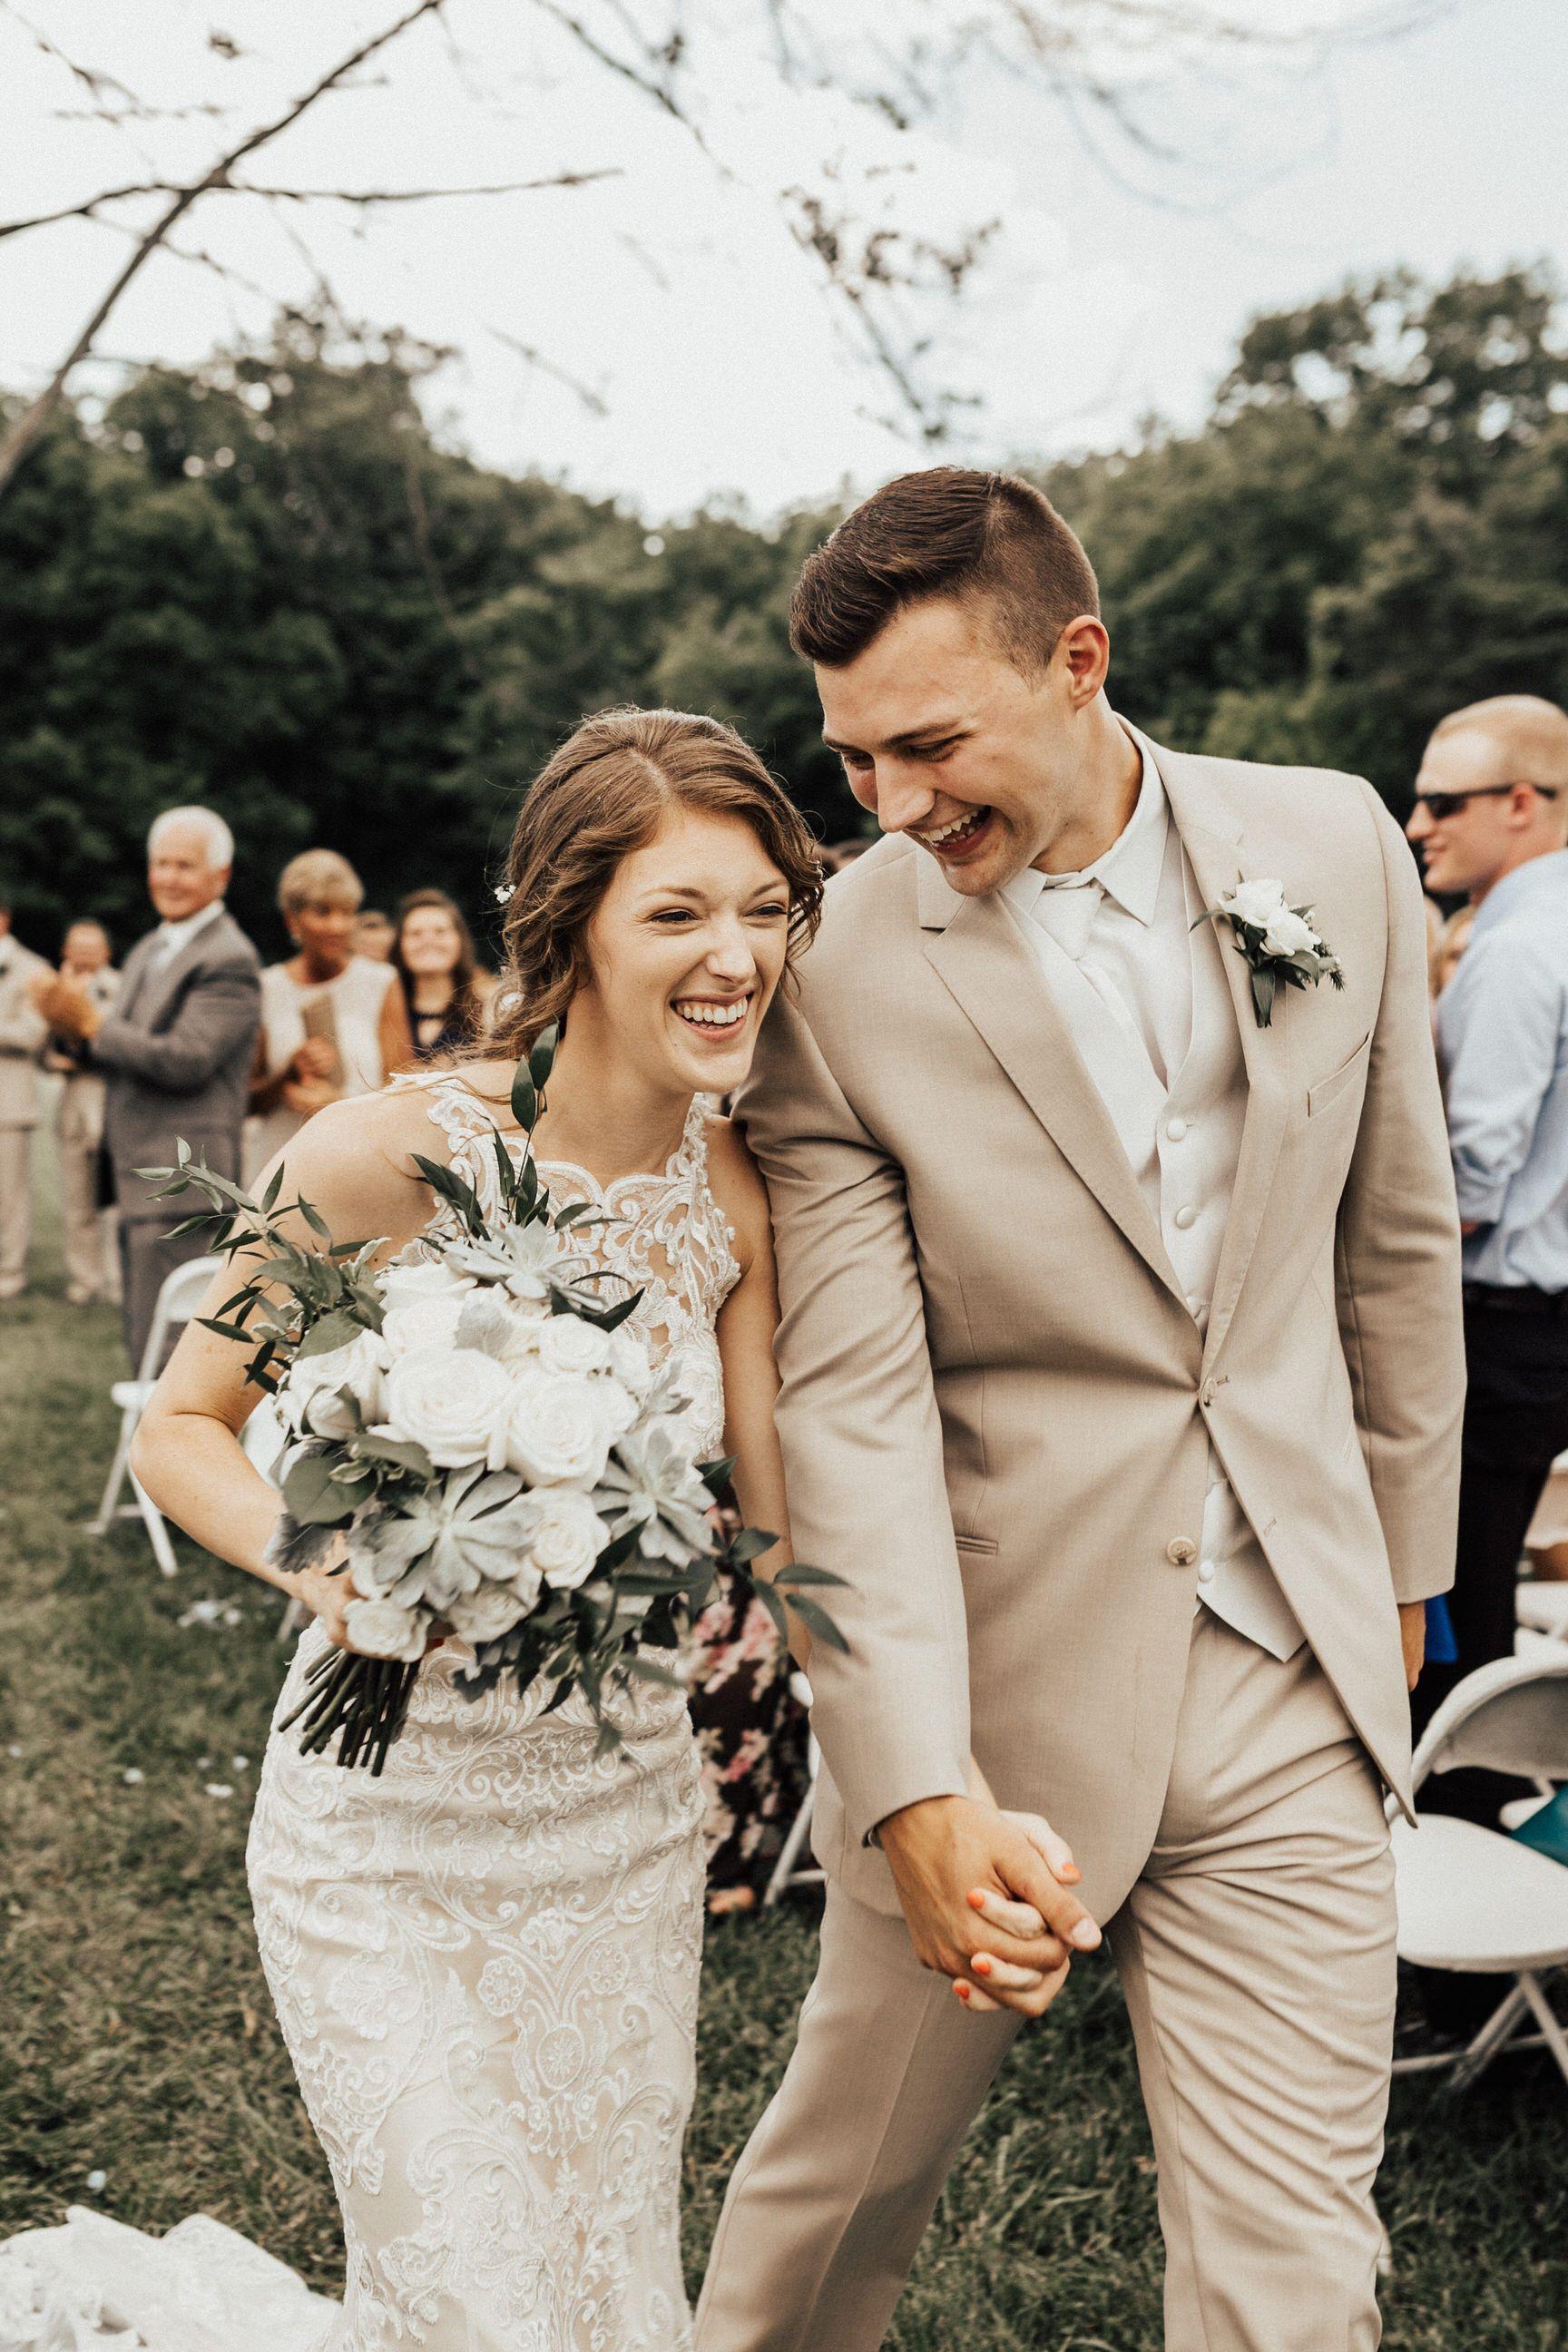 Ginger zee wedding dress  Pin by Avigale Sperry on wedding ideas  Pinterest  Woodsy wedding